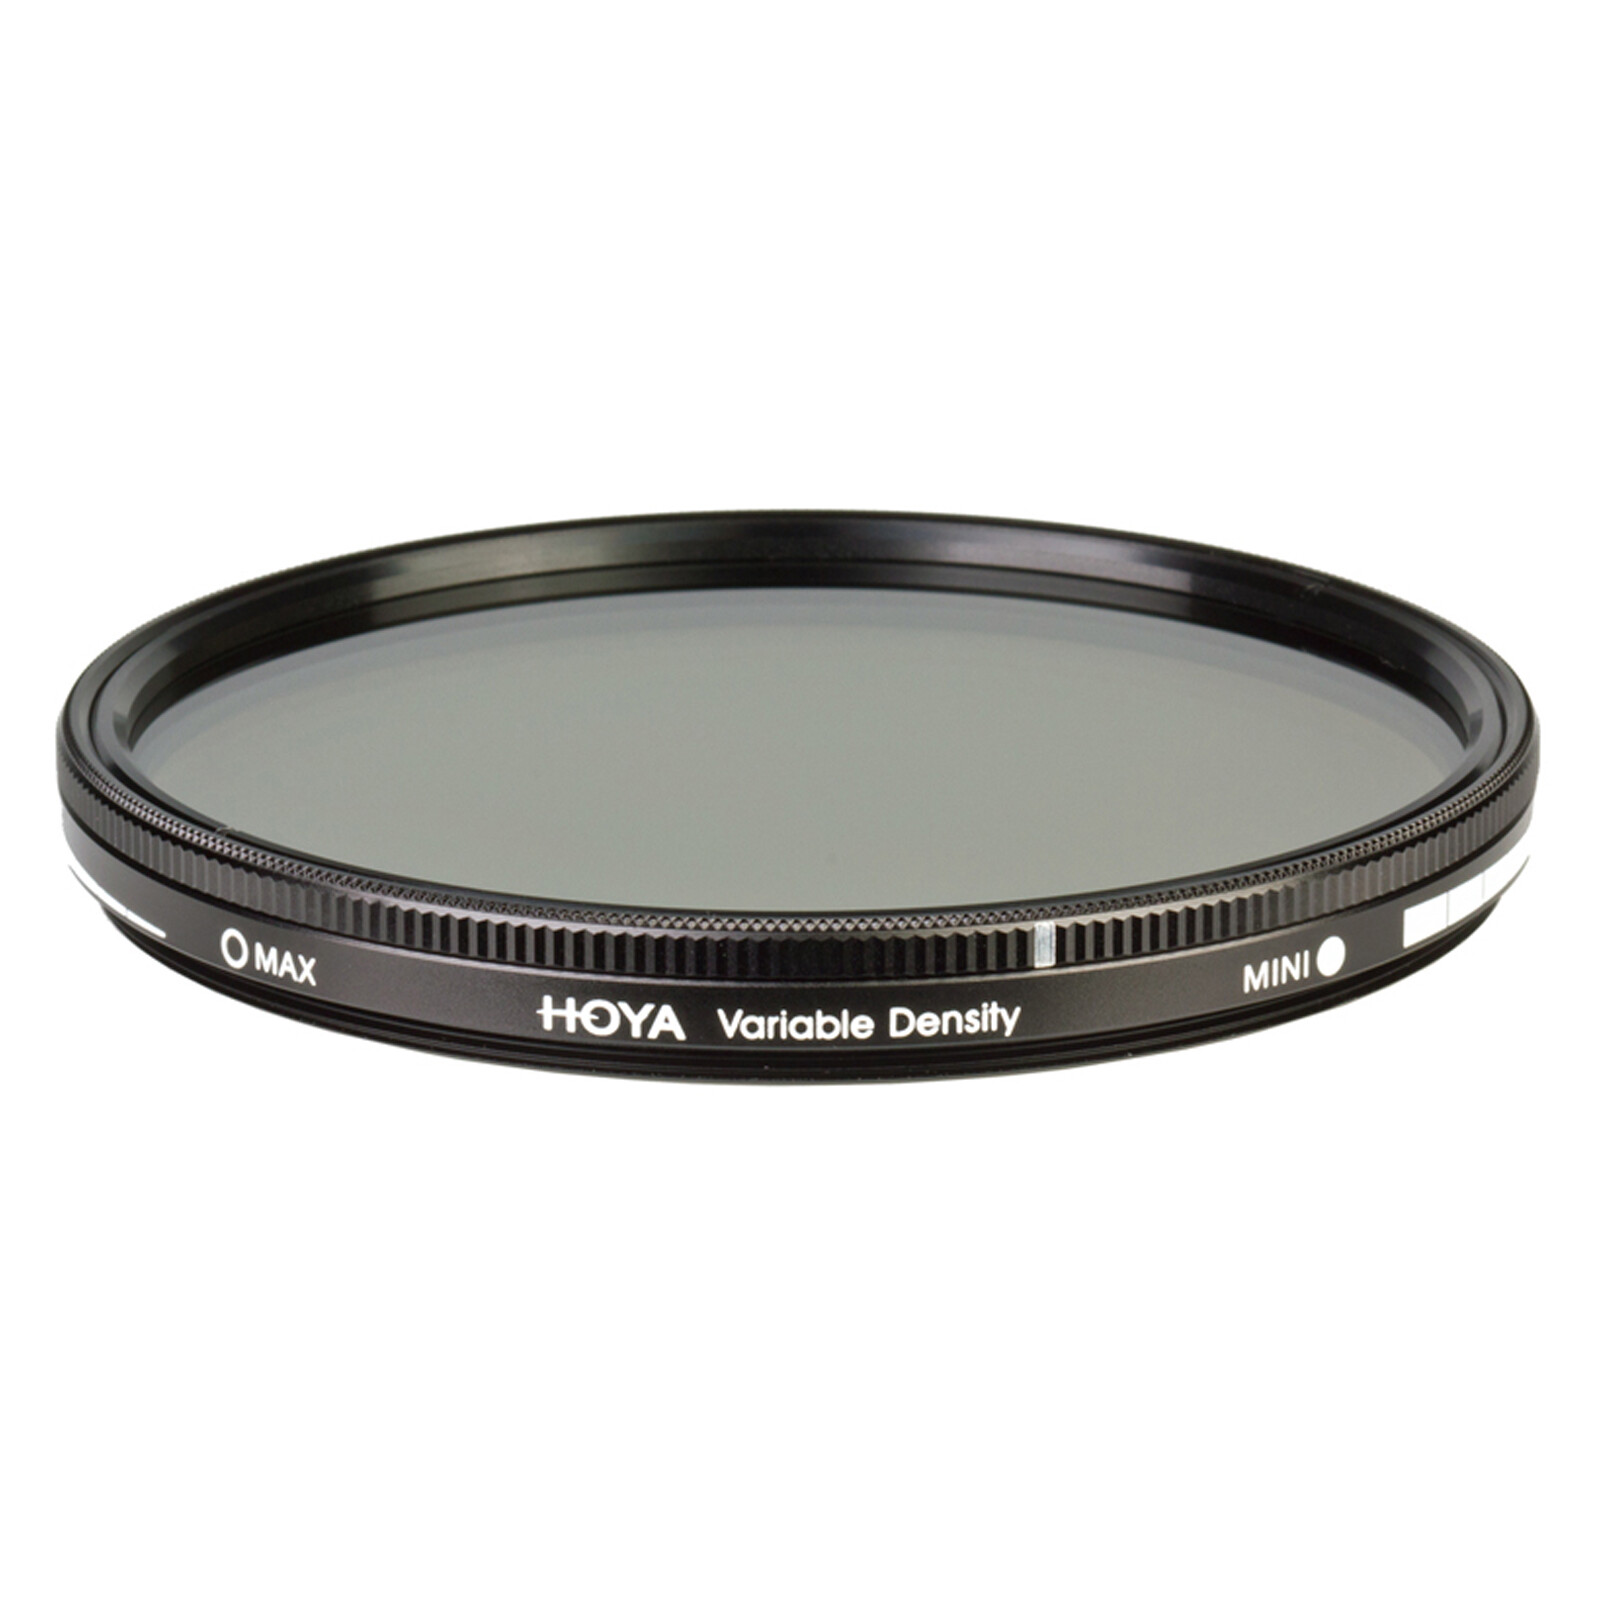 Hoya Variable Density 58mm